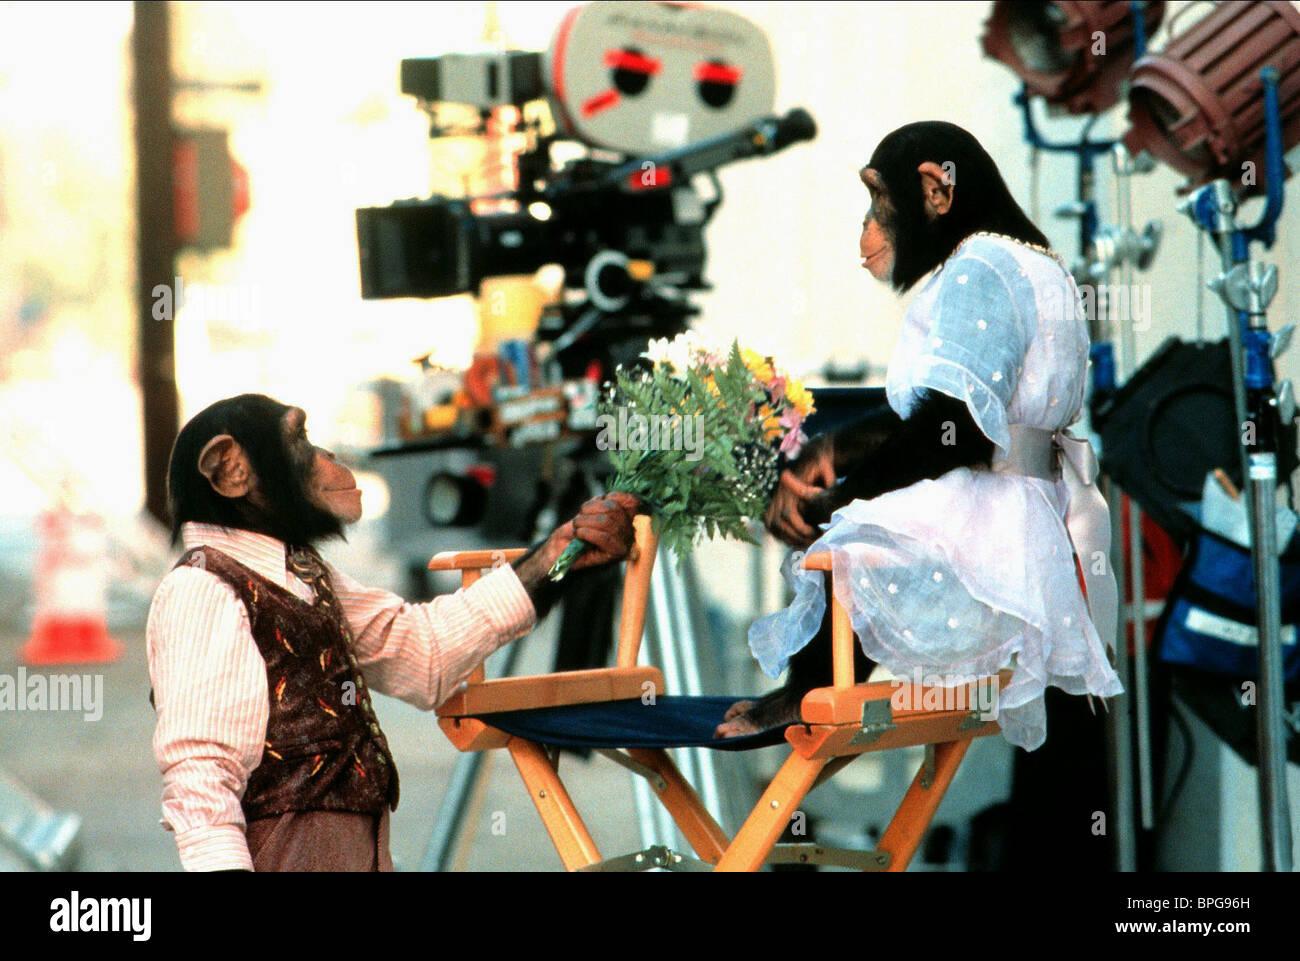 Los chimpancés Buddy (1997) Imagen De Stock